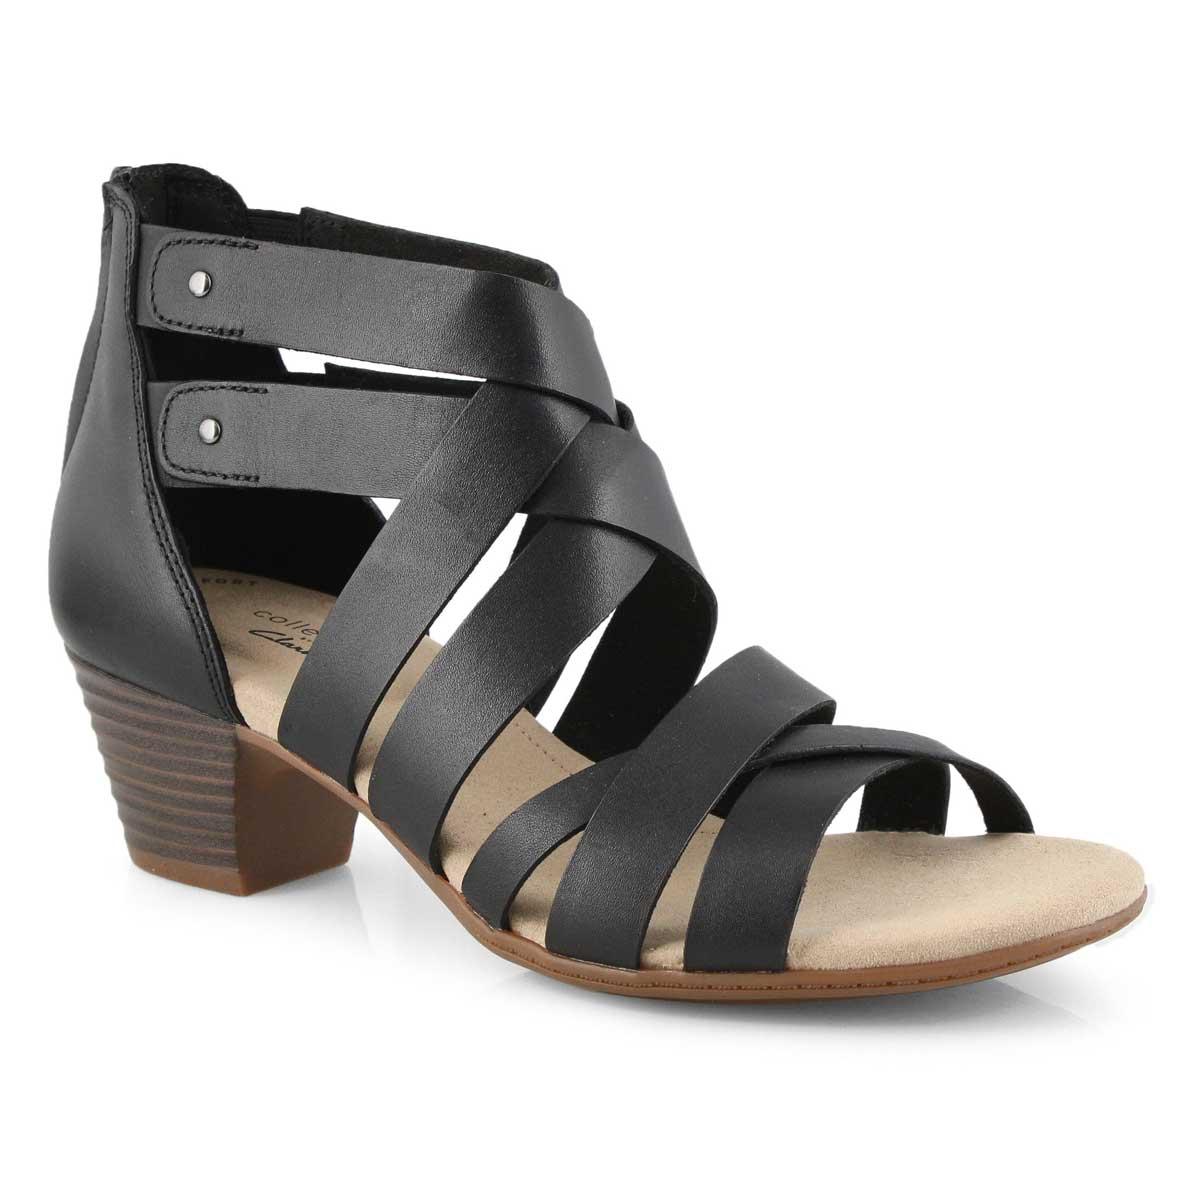 Lds Valarie Dream black dress sandals